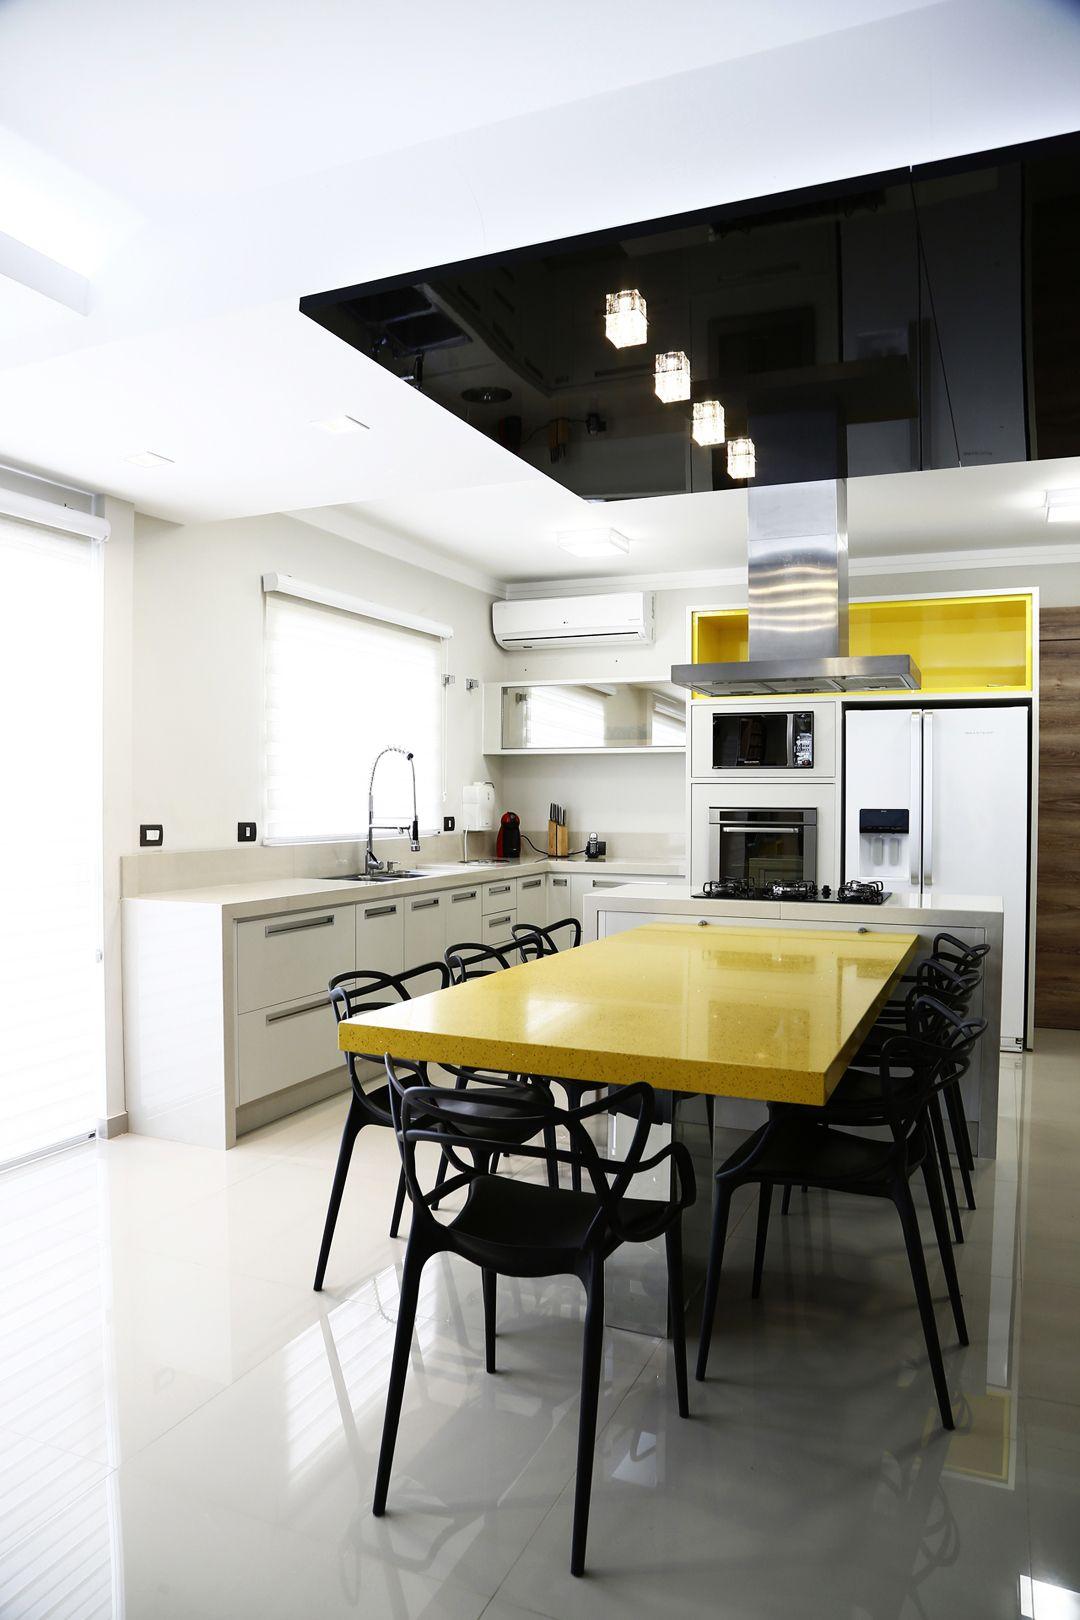 Cozinha kashmir nicho citrino paineis mezzo castani e preto basculantes reflecta mesa - Mesa de silestone ...